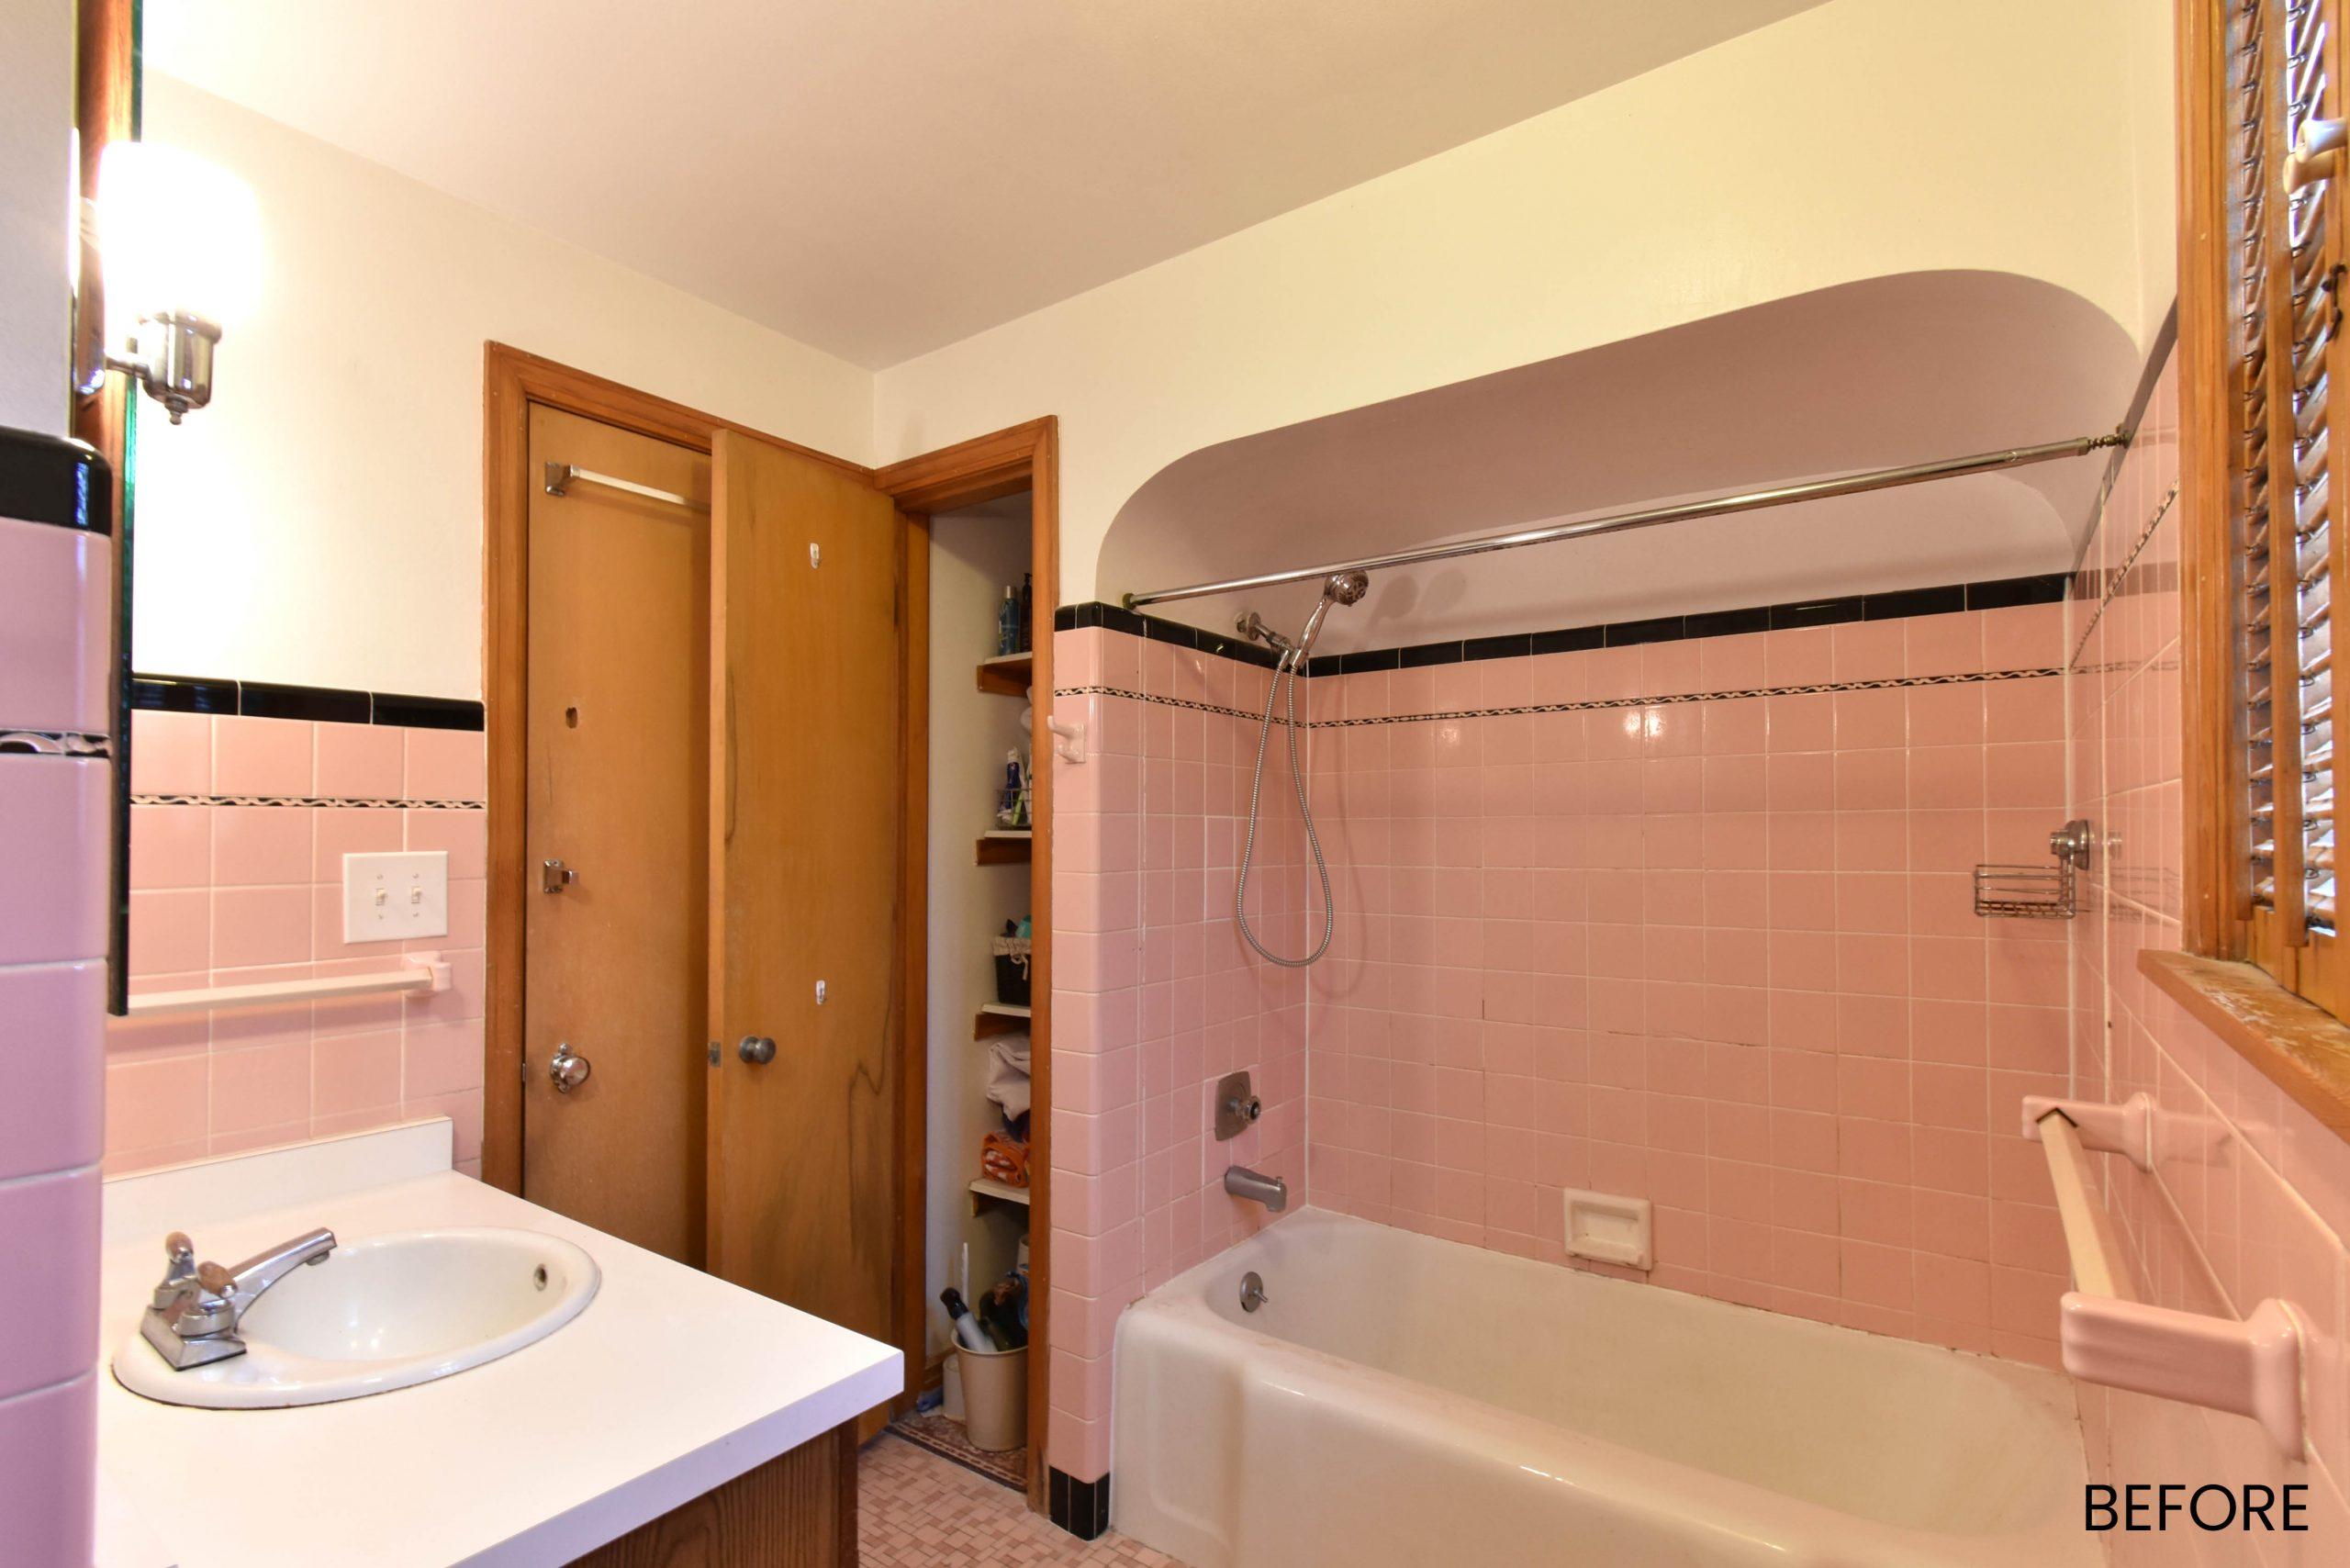 Wauwatosa-pink-bath-remodel-1565